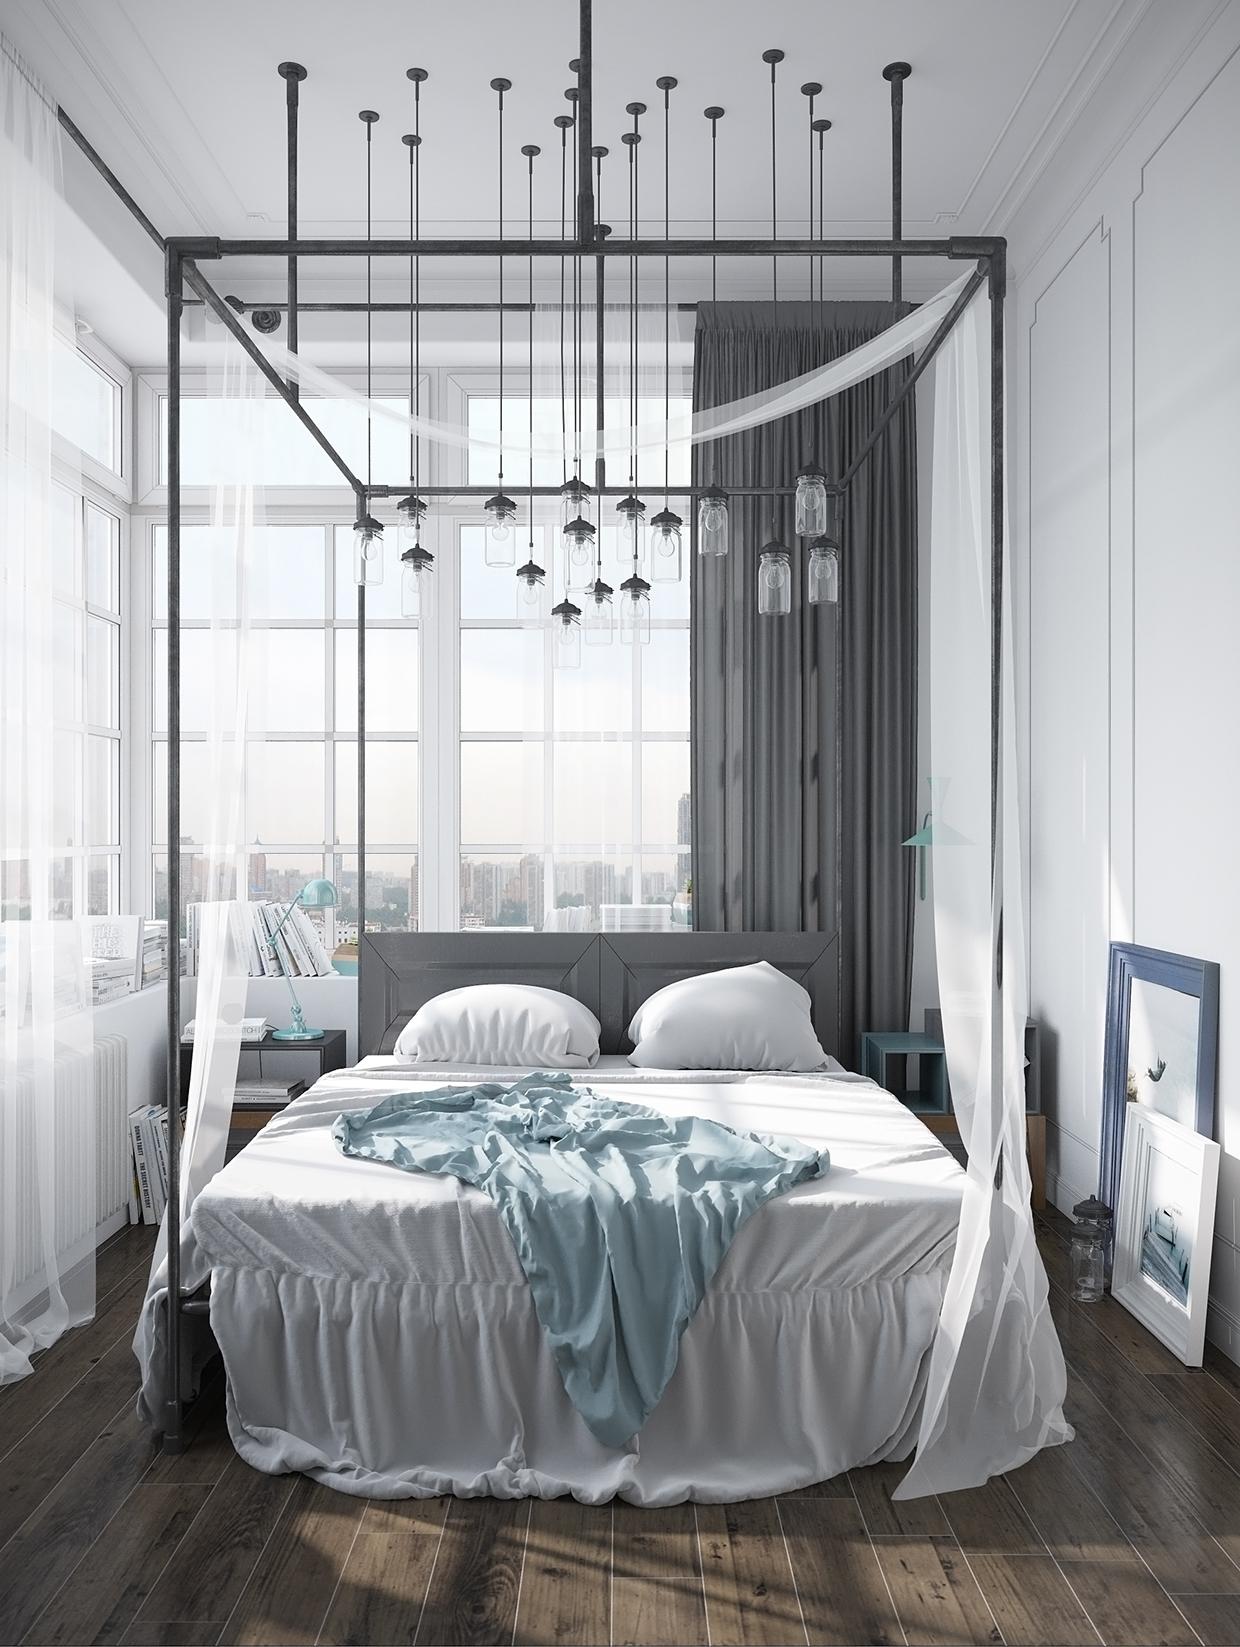 scandinavian bedrooms ideas and inspiration. Black Bedroom Furniture Sets. Home Design Ideas